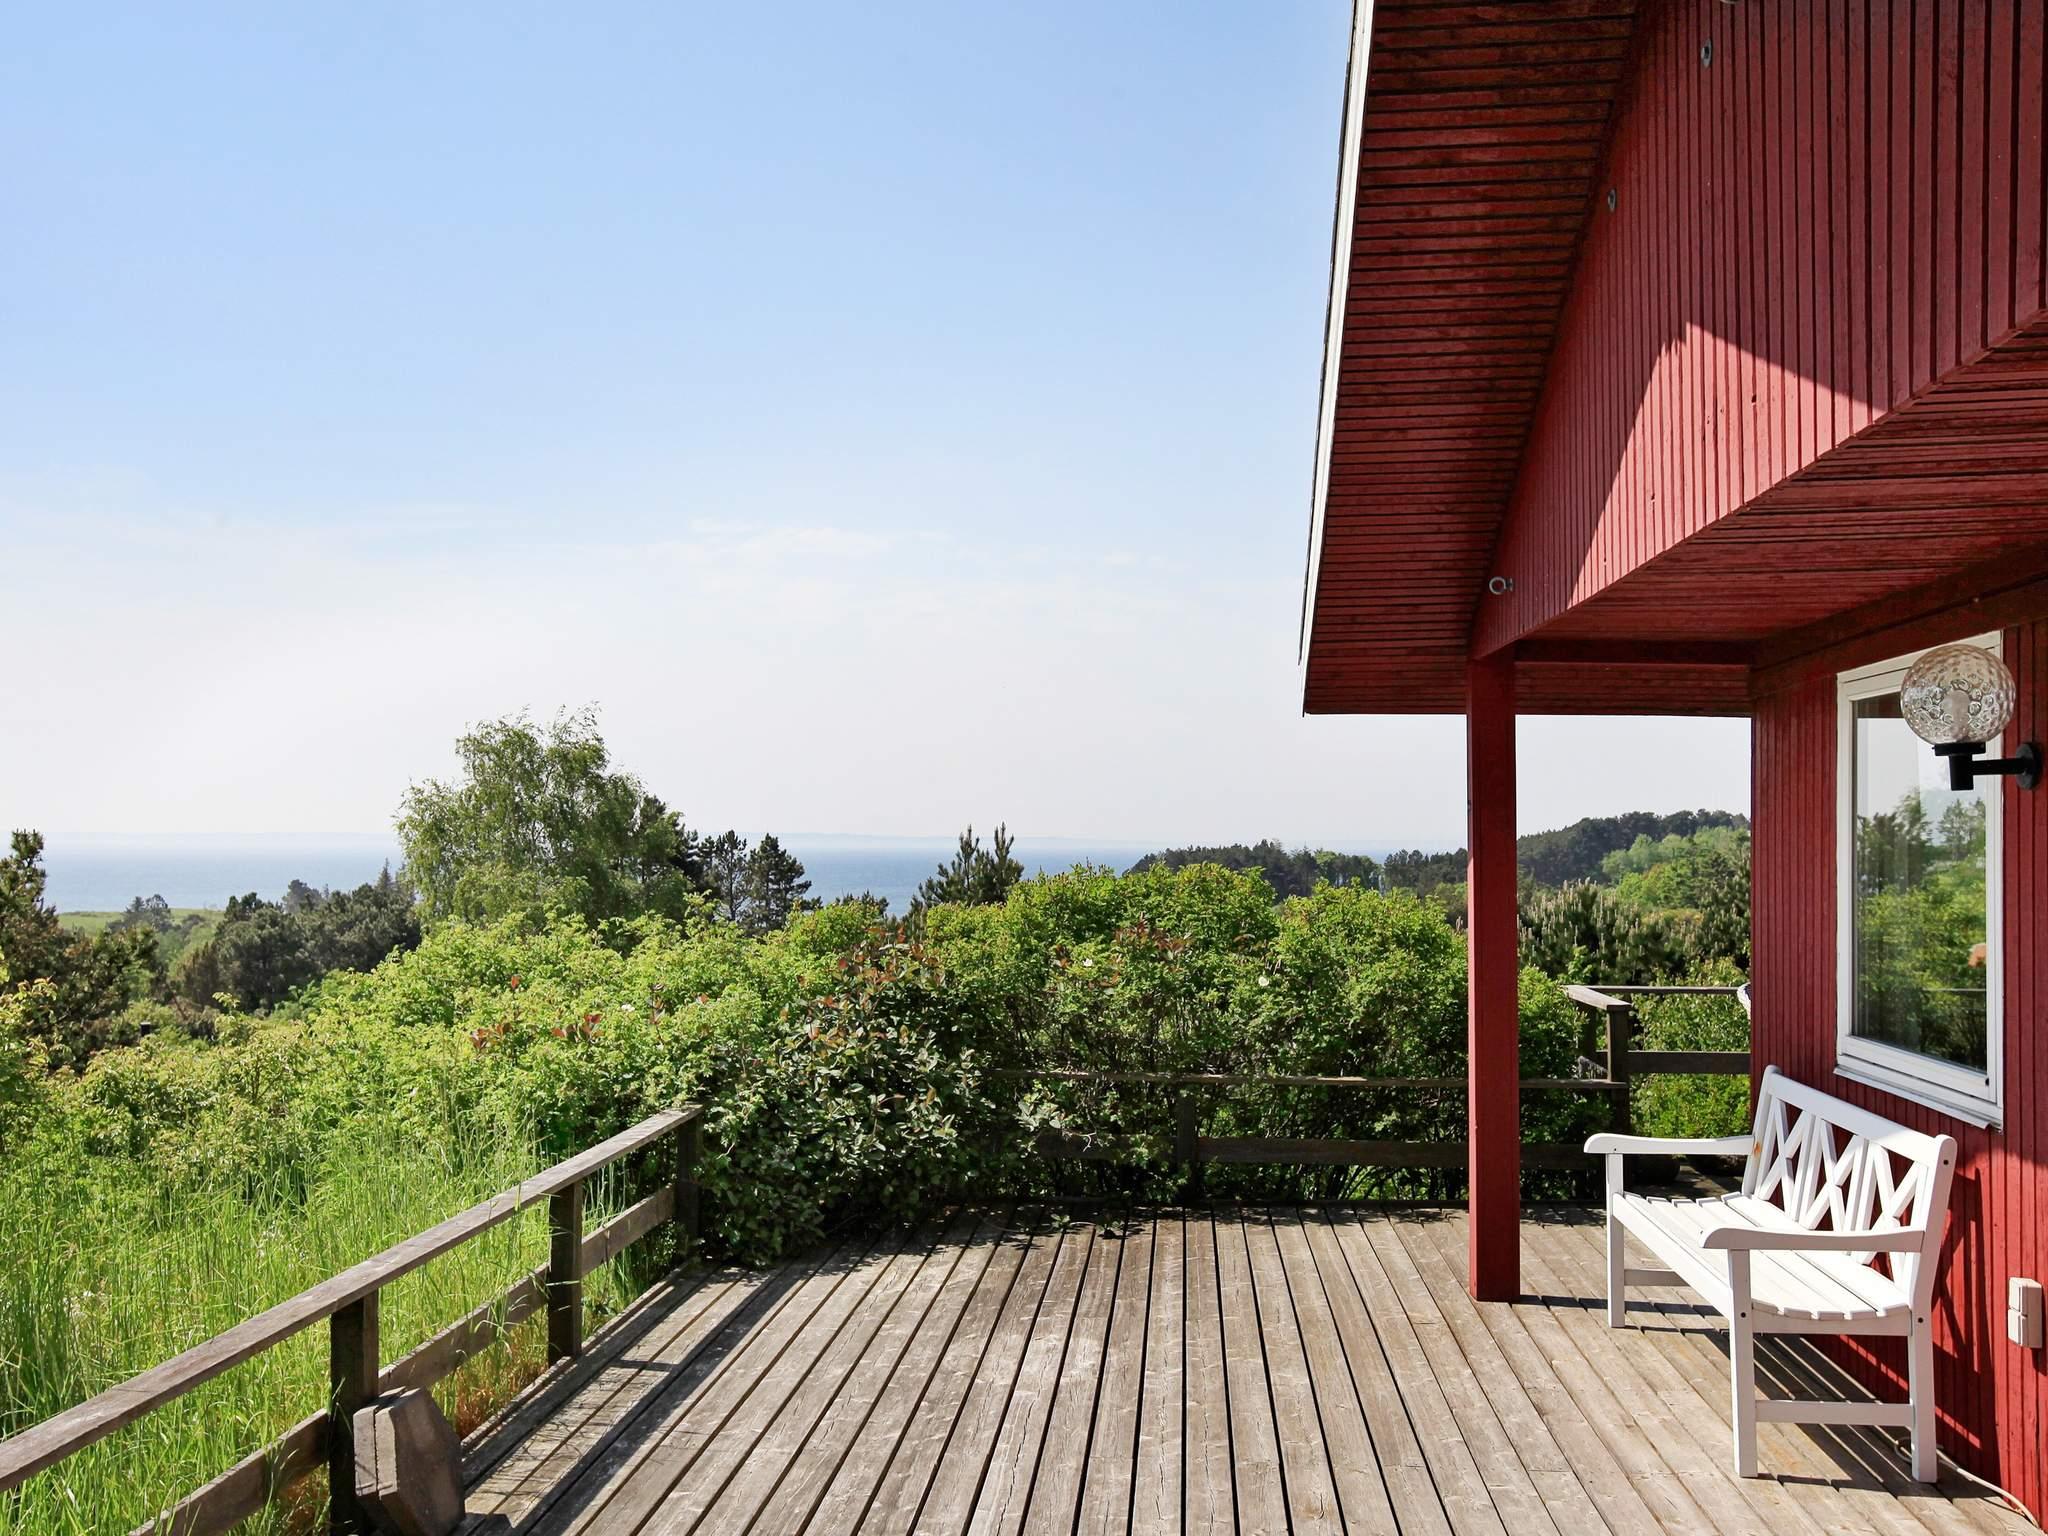 Maison de vacances Helgenæs (921415), Knebel, , Jutland Est, Danemark, image 13